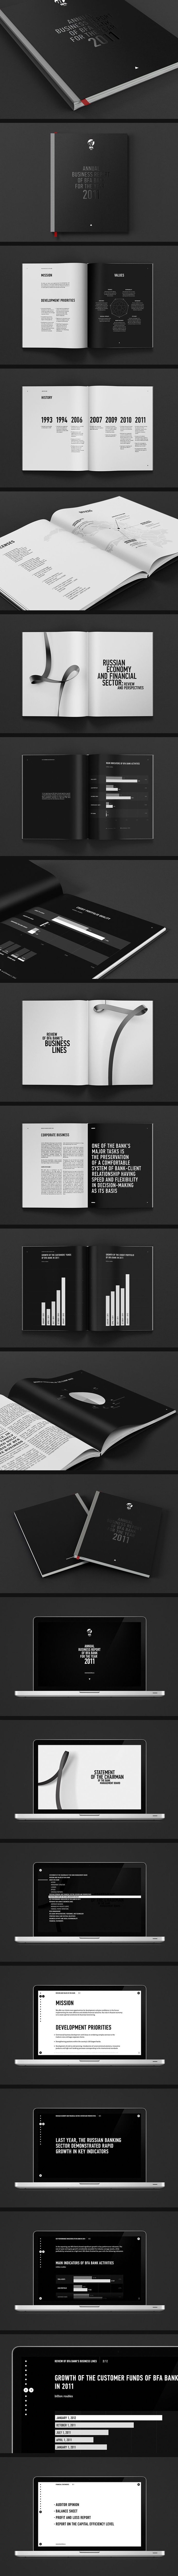 black on black :: spot varnish  2011 Annual Report for BFA Bank on Behance                                                                                                                                                                                 More